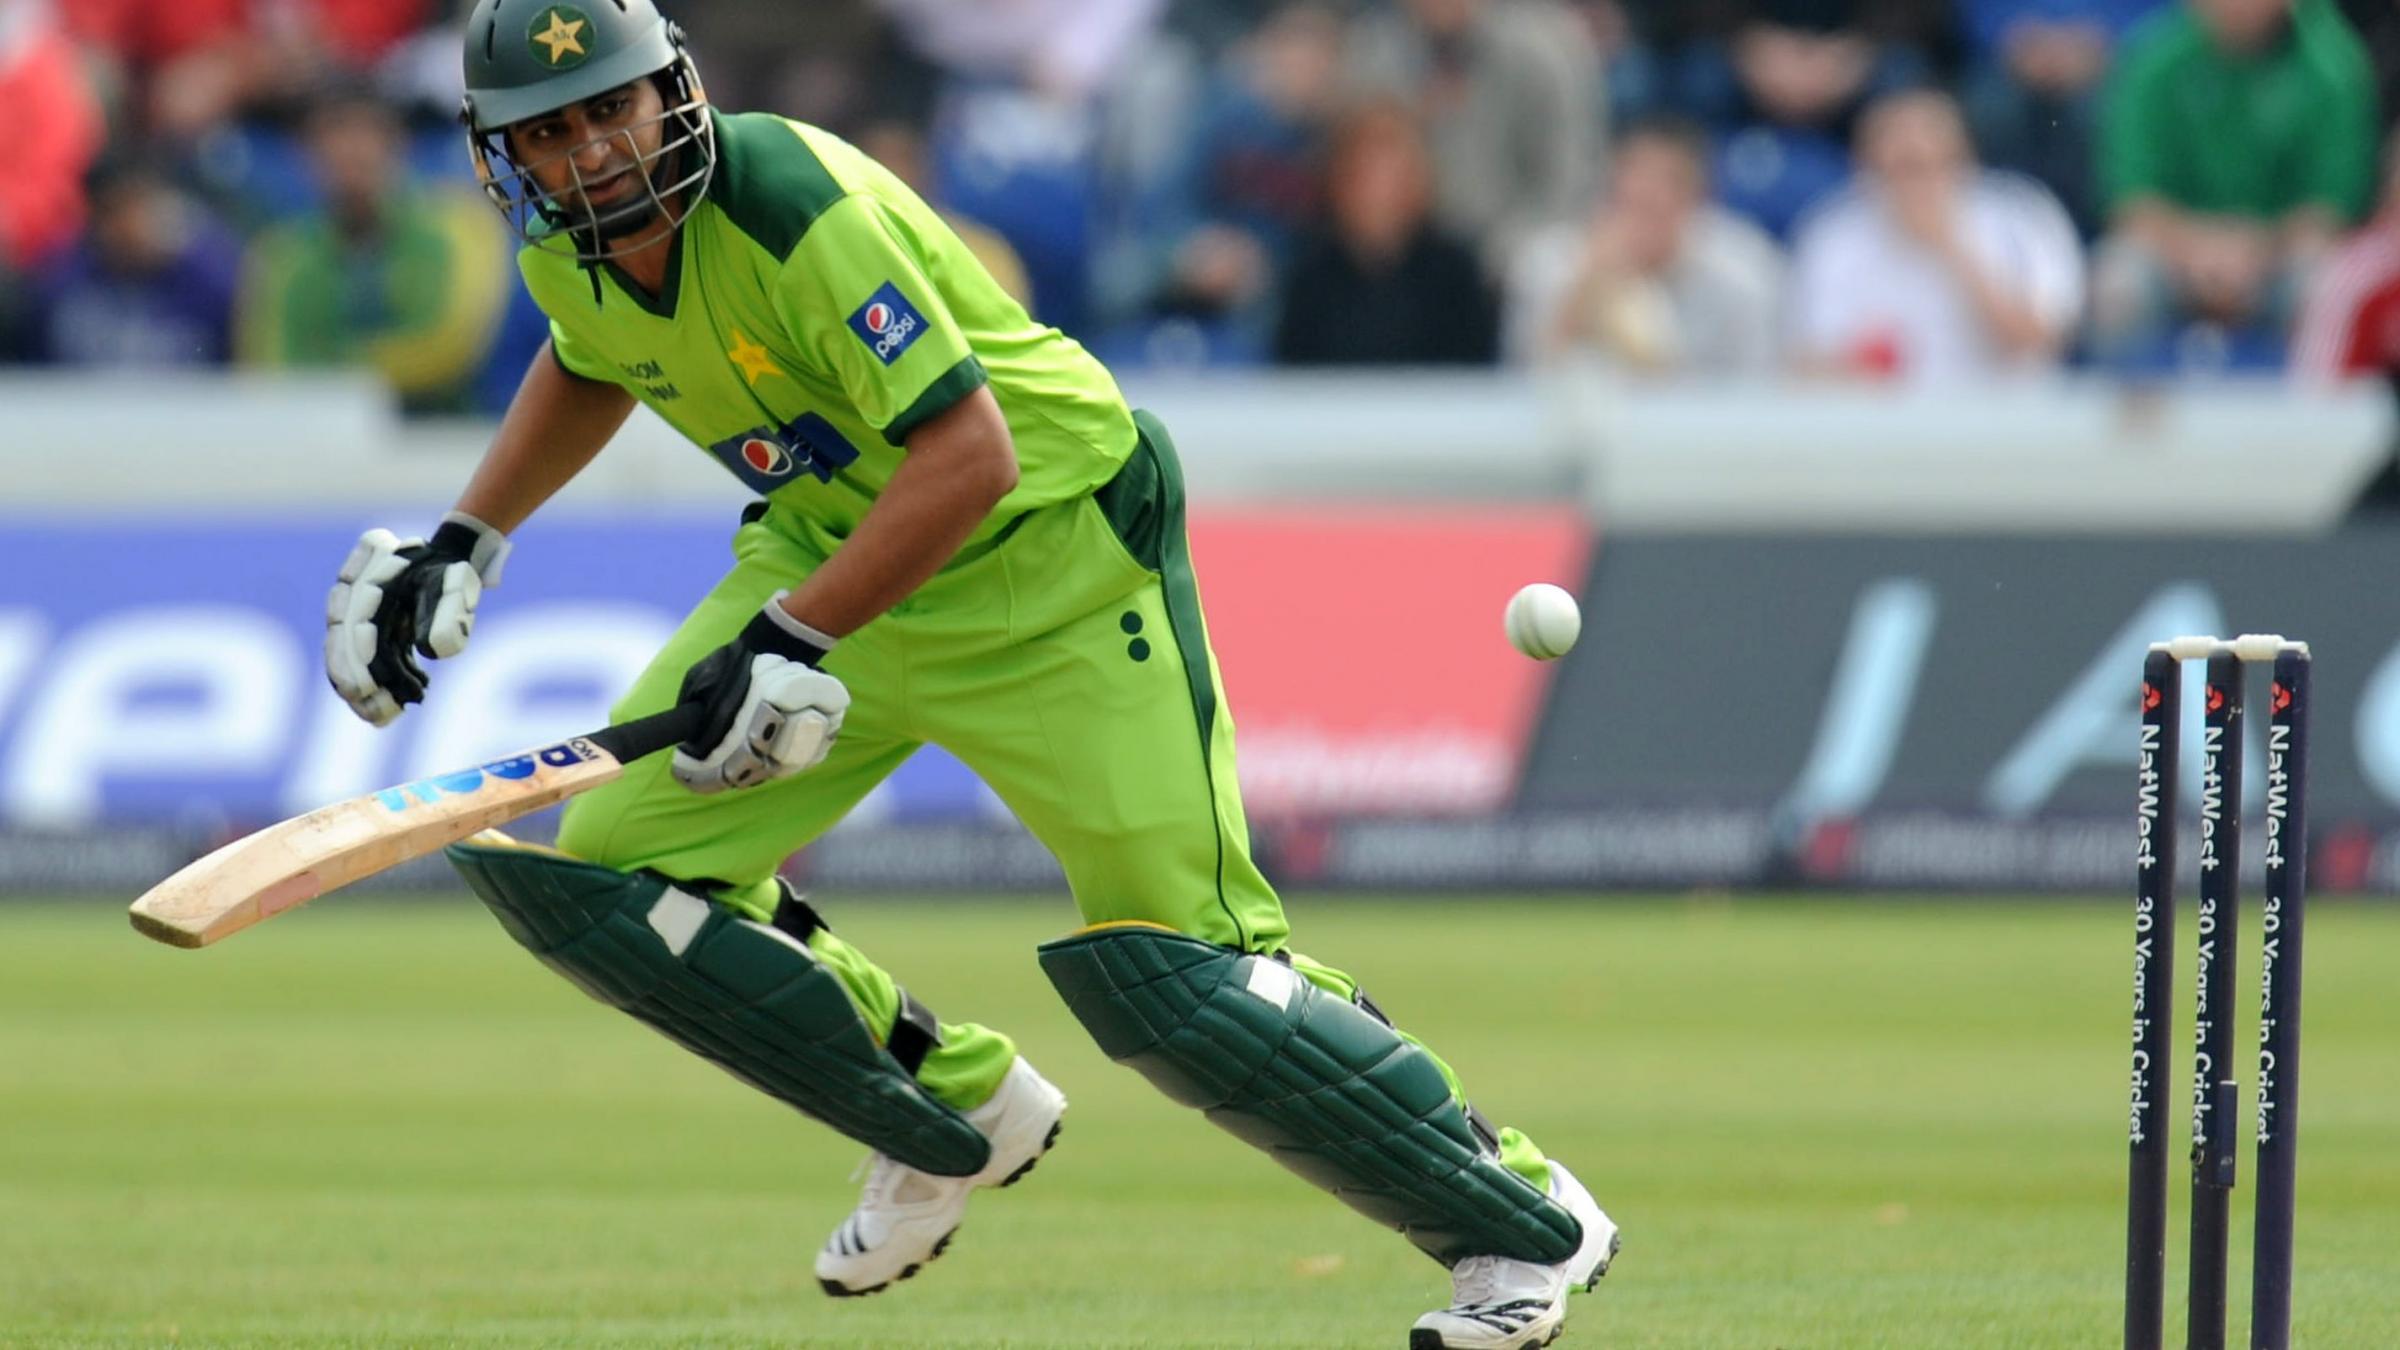 Shahzaib Hasan被巴基斯坦板球委员会暂停